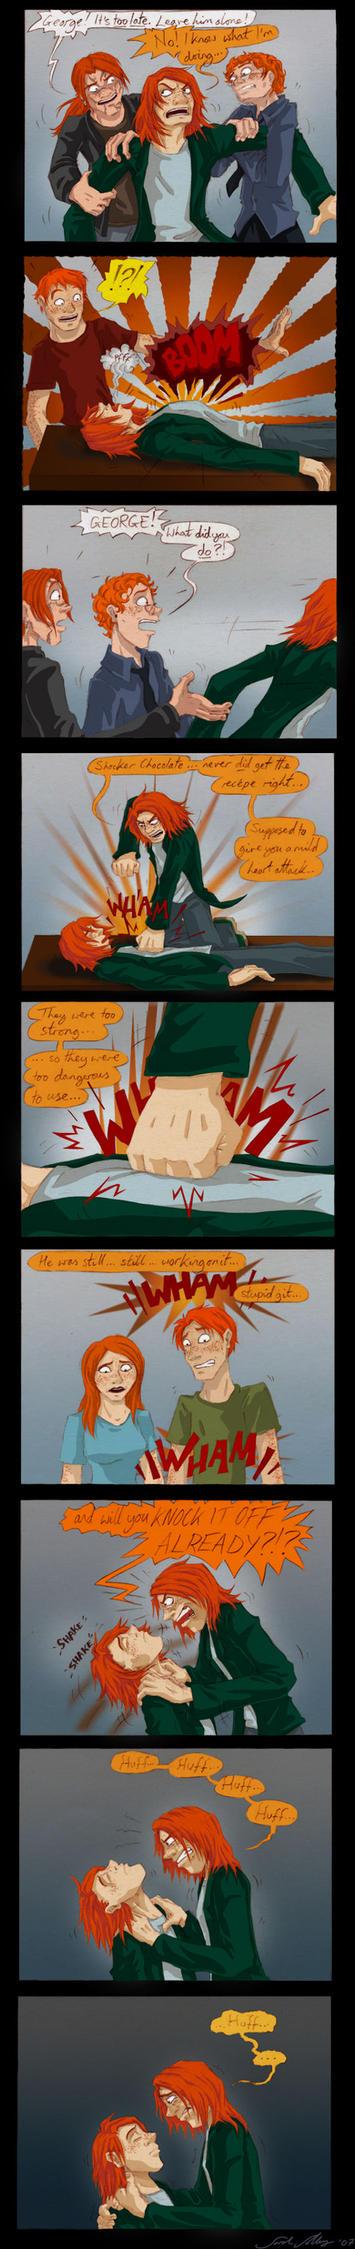 Deathly Hallows- Posthumerous2 by olafpriol